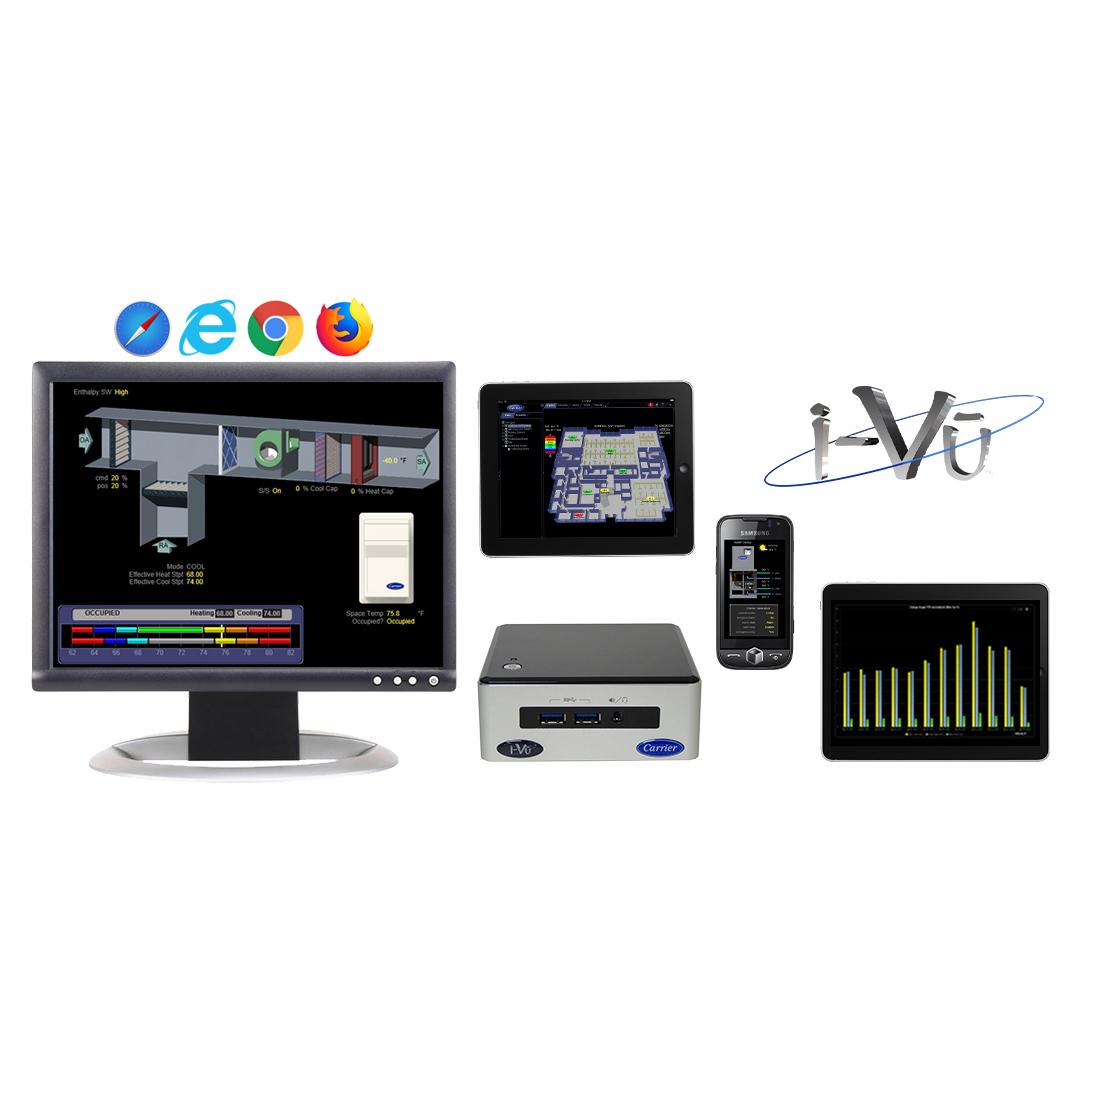 carrier-CIV-OPN-i-vu-web-based-operator-interface